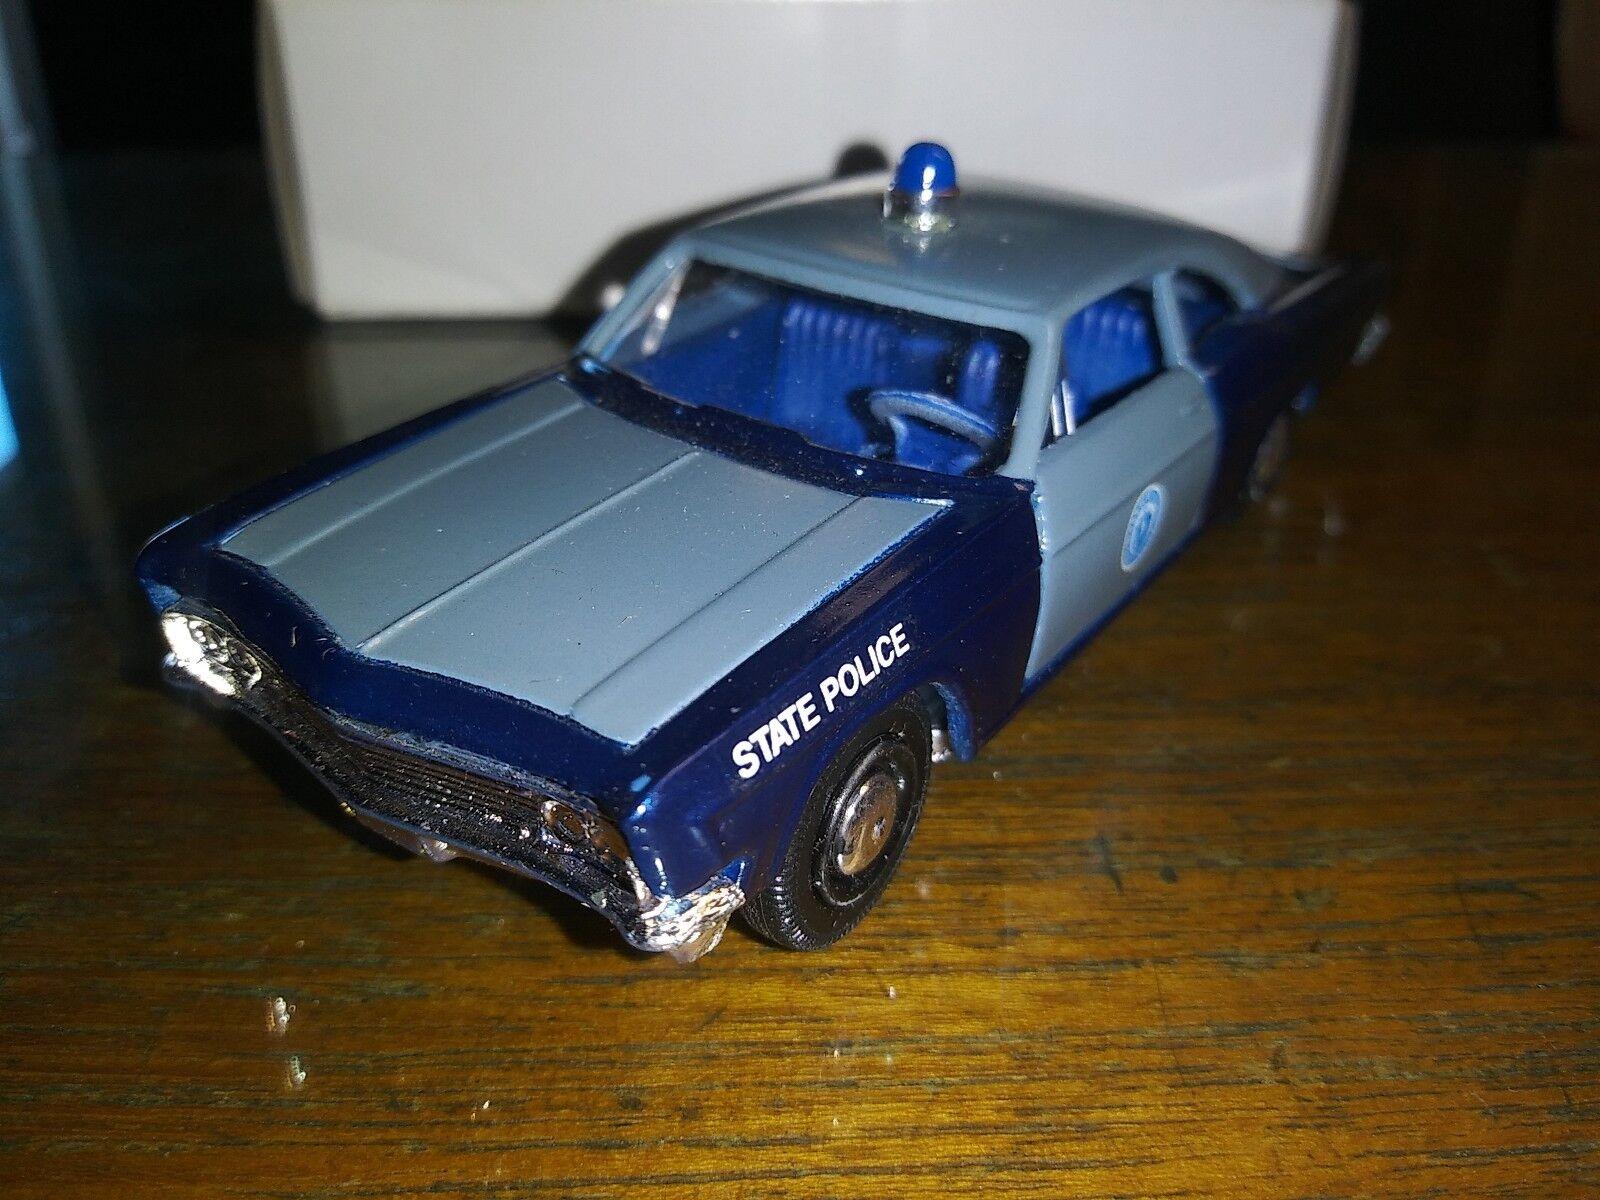 1966 NOS CHEVROLET IMPALA VINTAGE 2 DOOR POLICE CAR Extremely Rare.Diecast 1 43